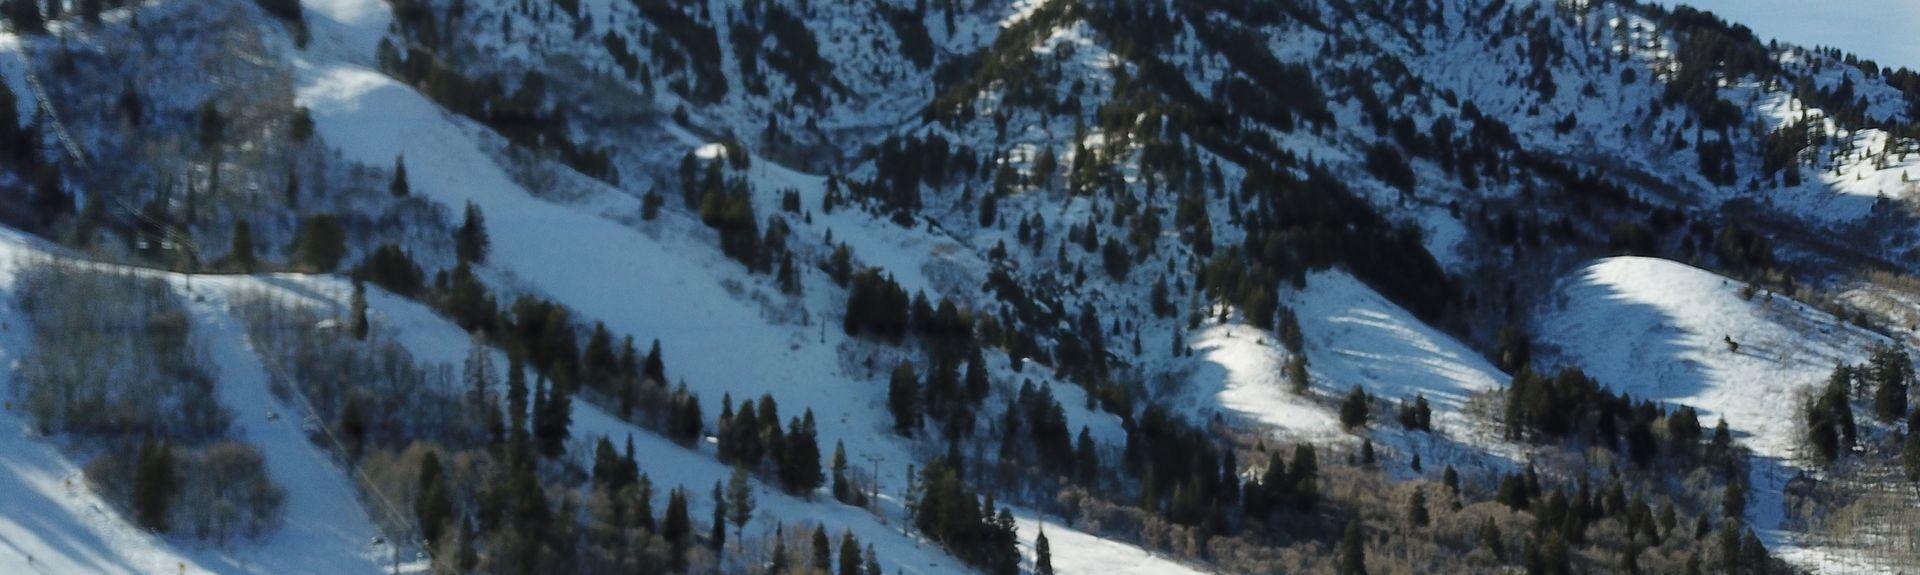 Snowbasin Ski Resort, Huntsville, UT, USA